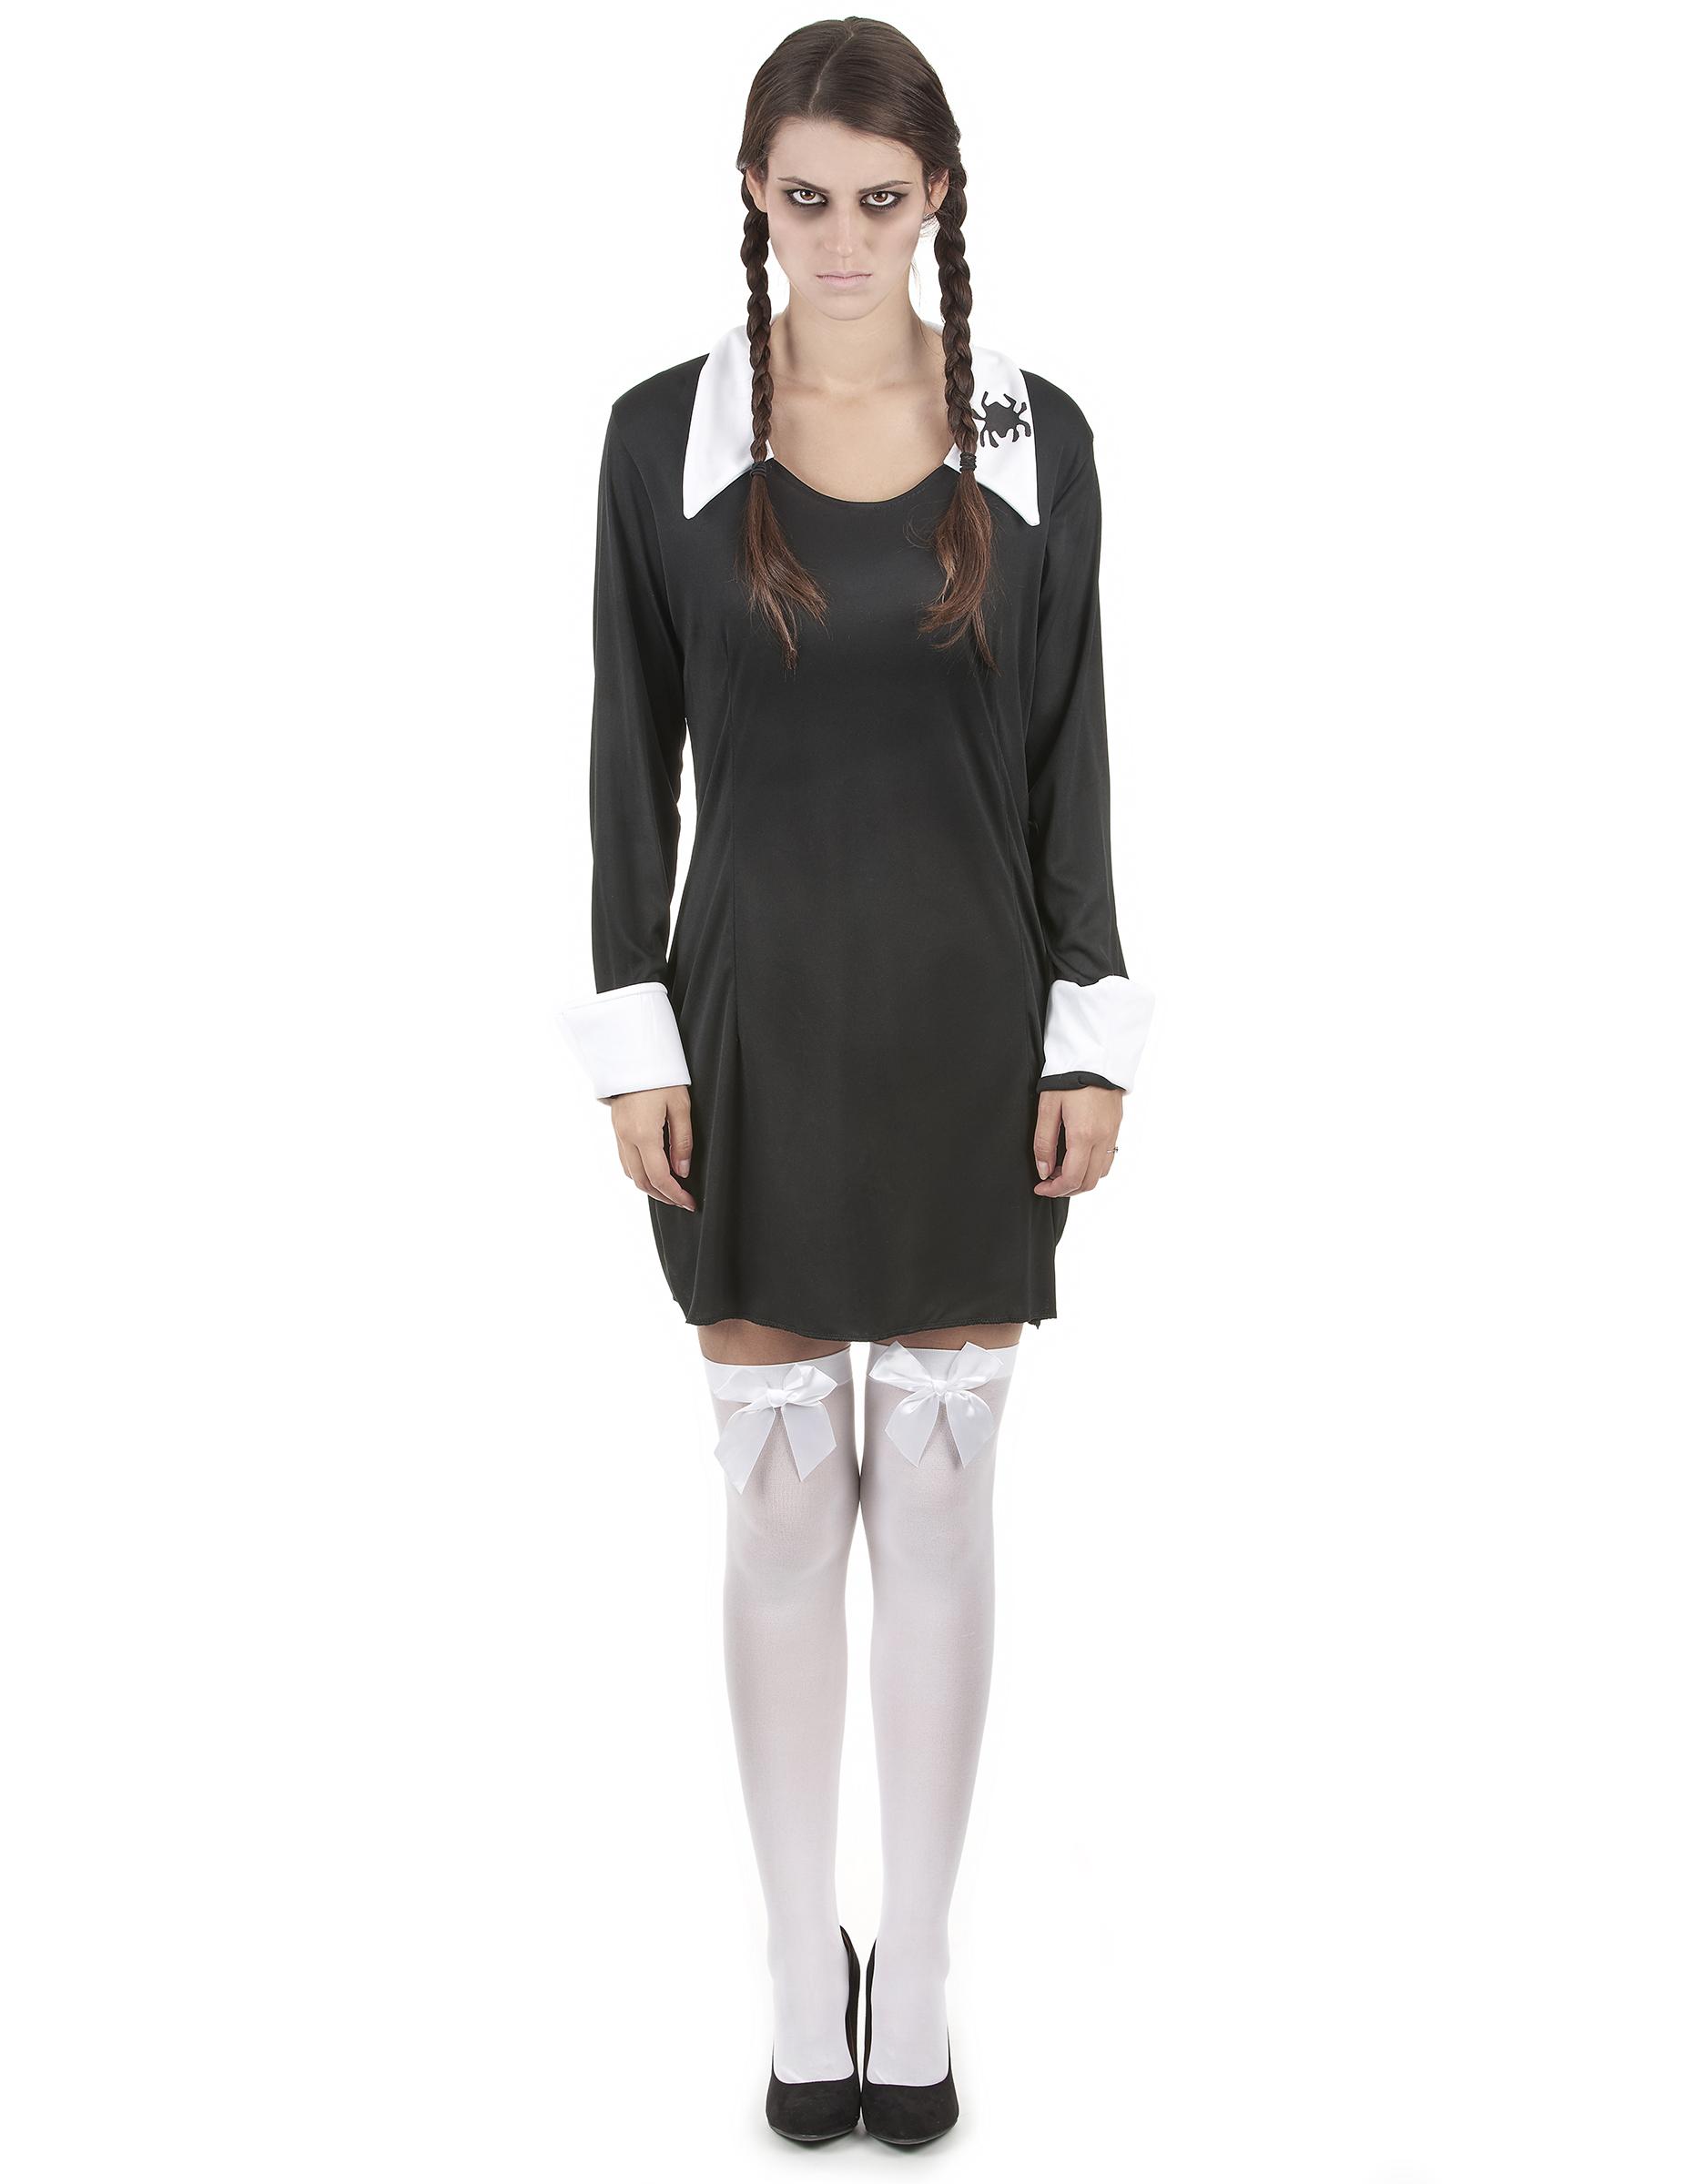 a57b85b17 Disfraz colegiala mujer Halloween